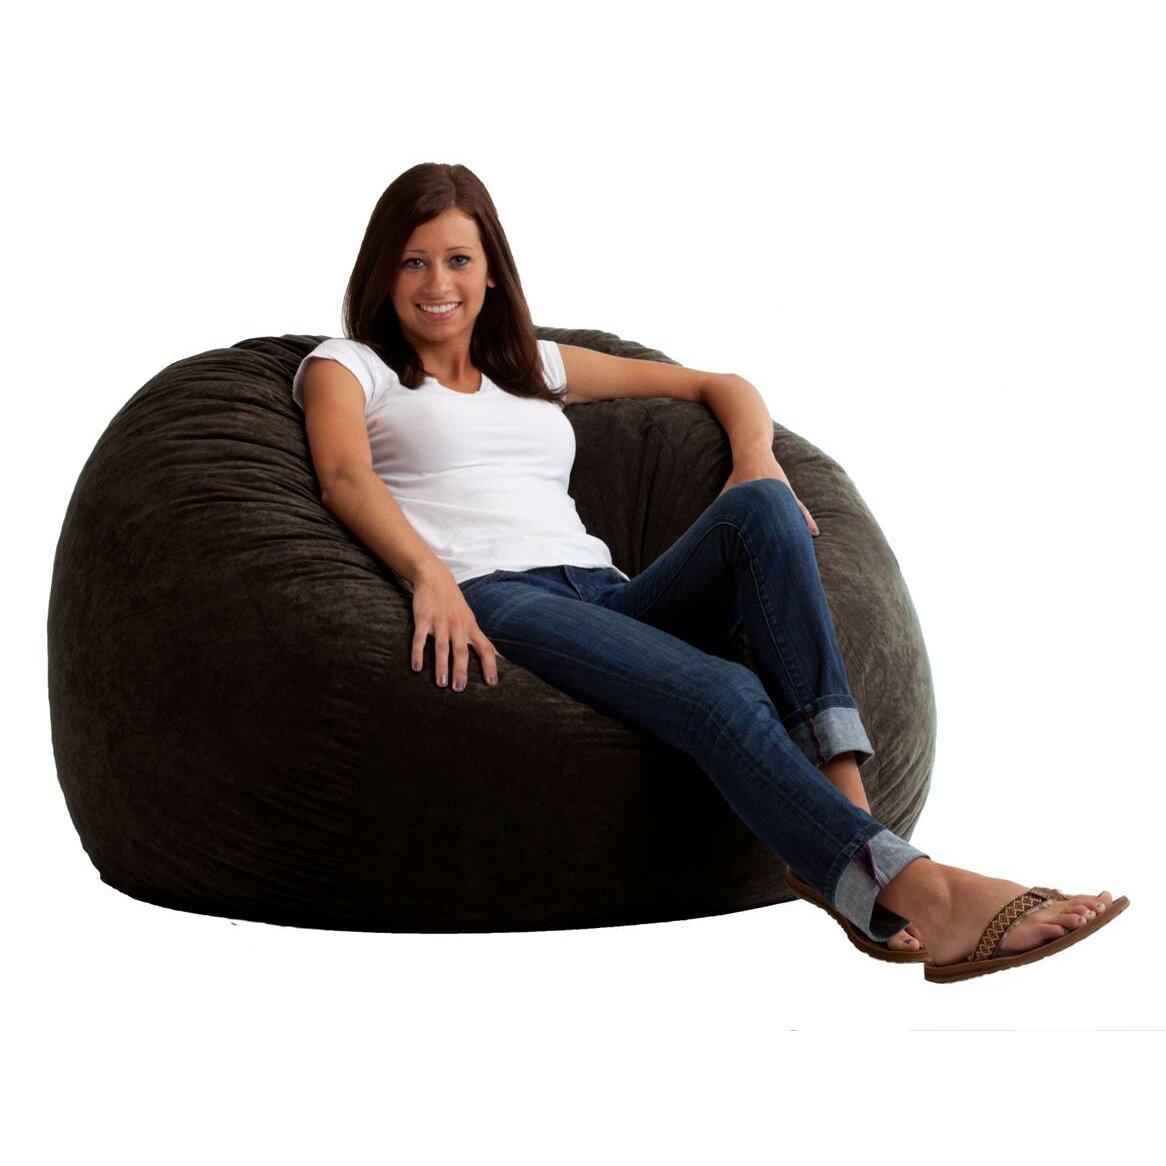 Comfort Research Fuf Bean Bag Chair & Reviews | Wayfair